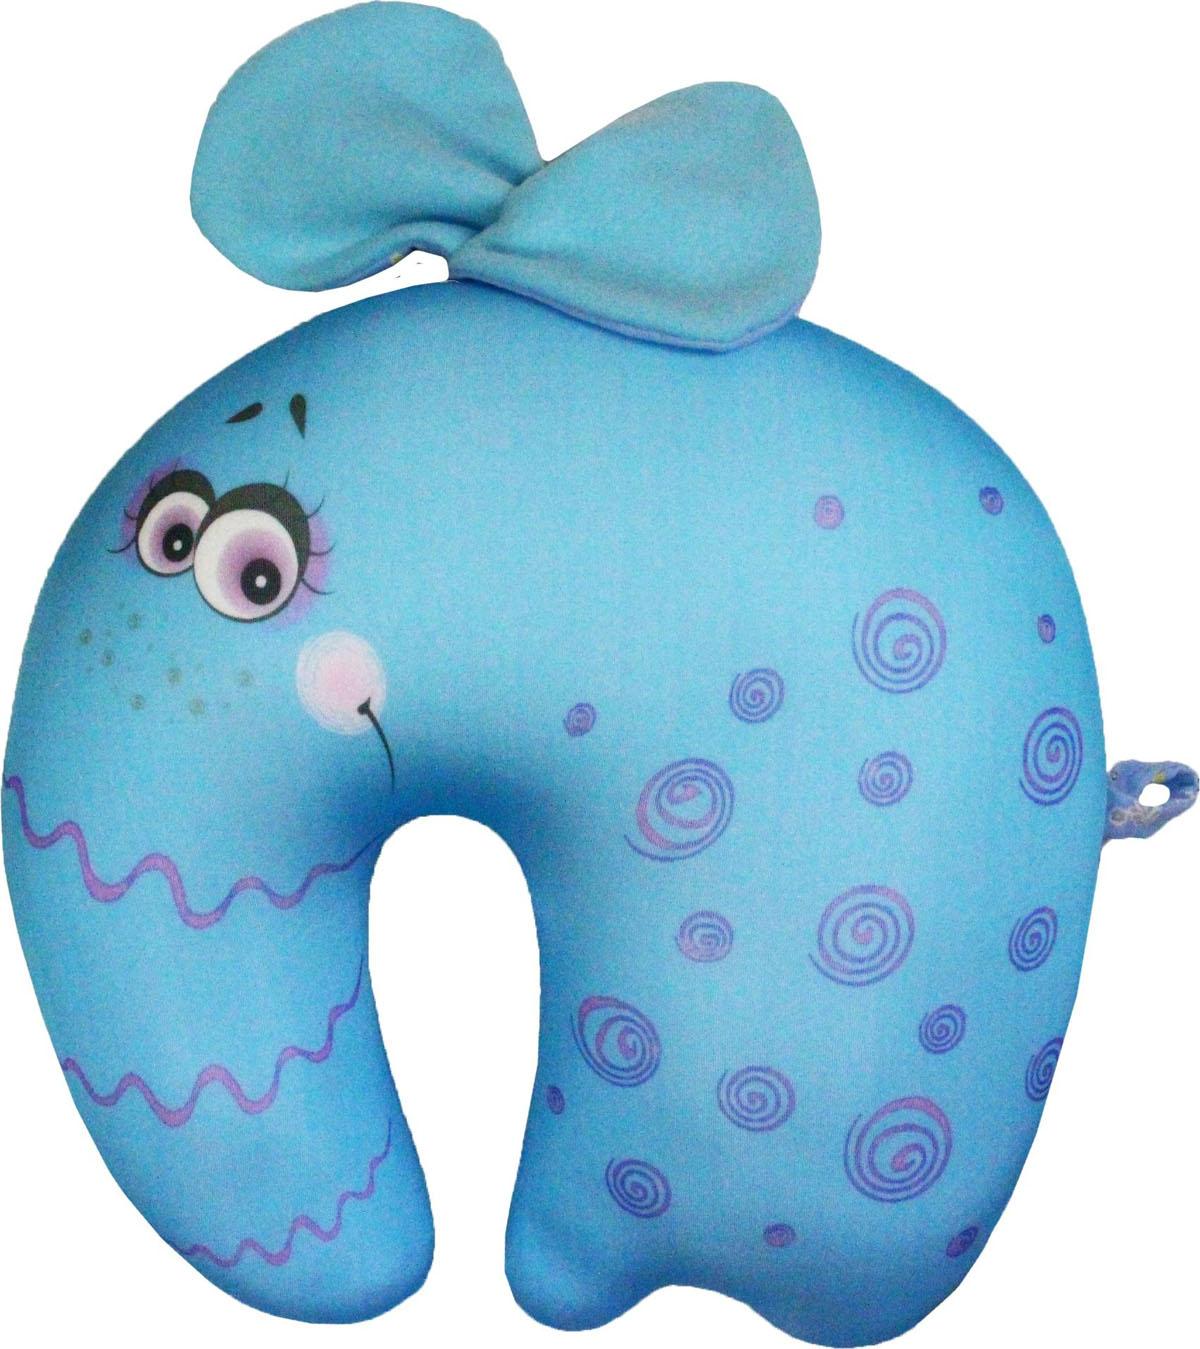 Подушка-антистресс для шеи Слоники, цвет: голубой, 32 х 30 см